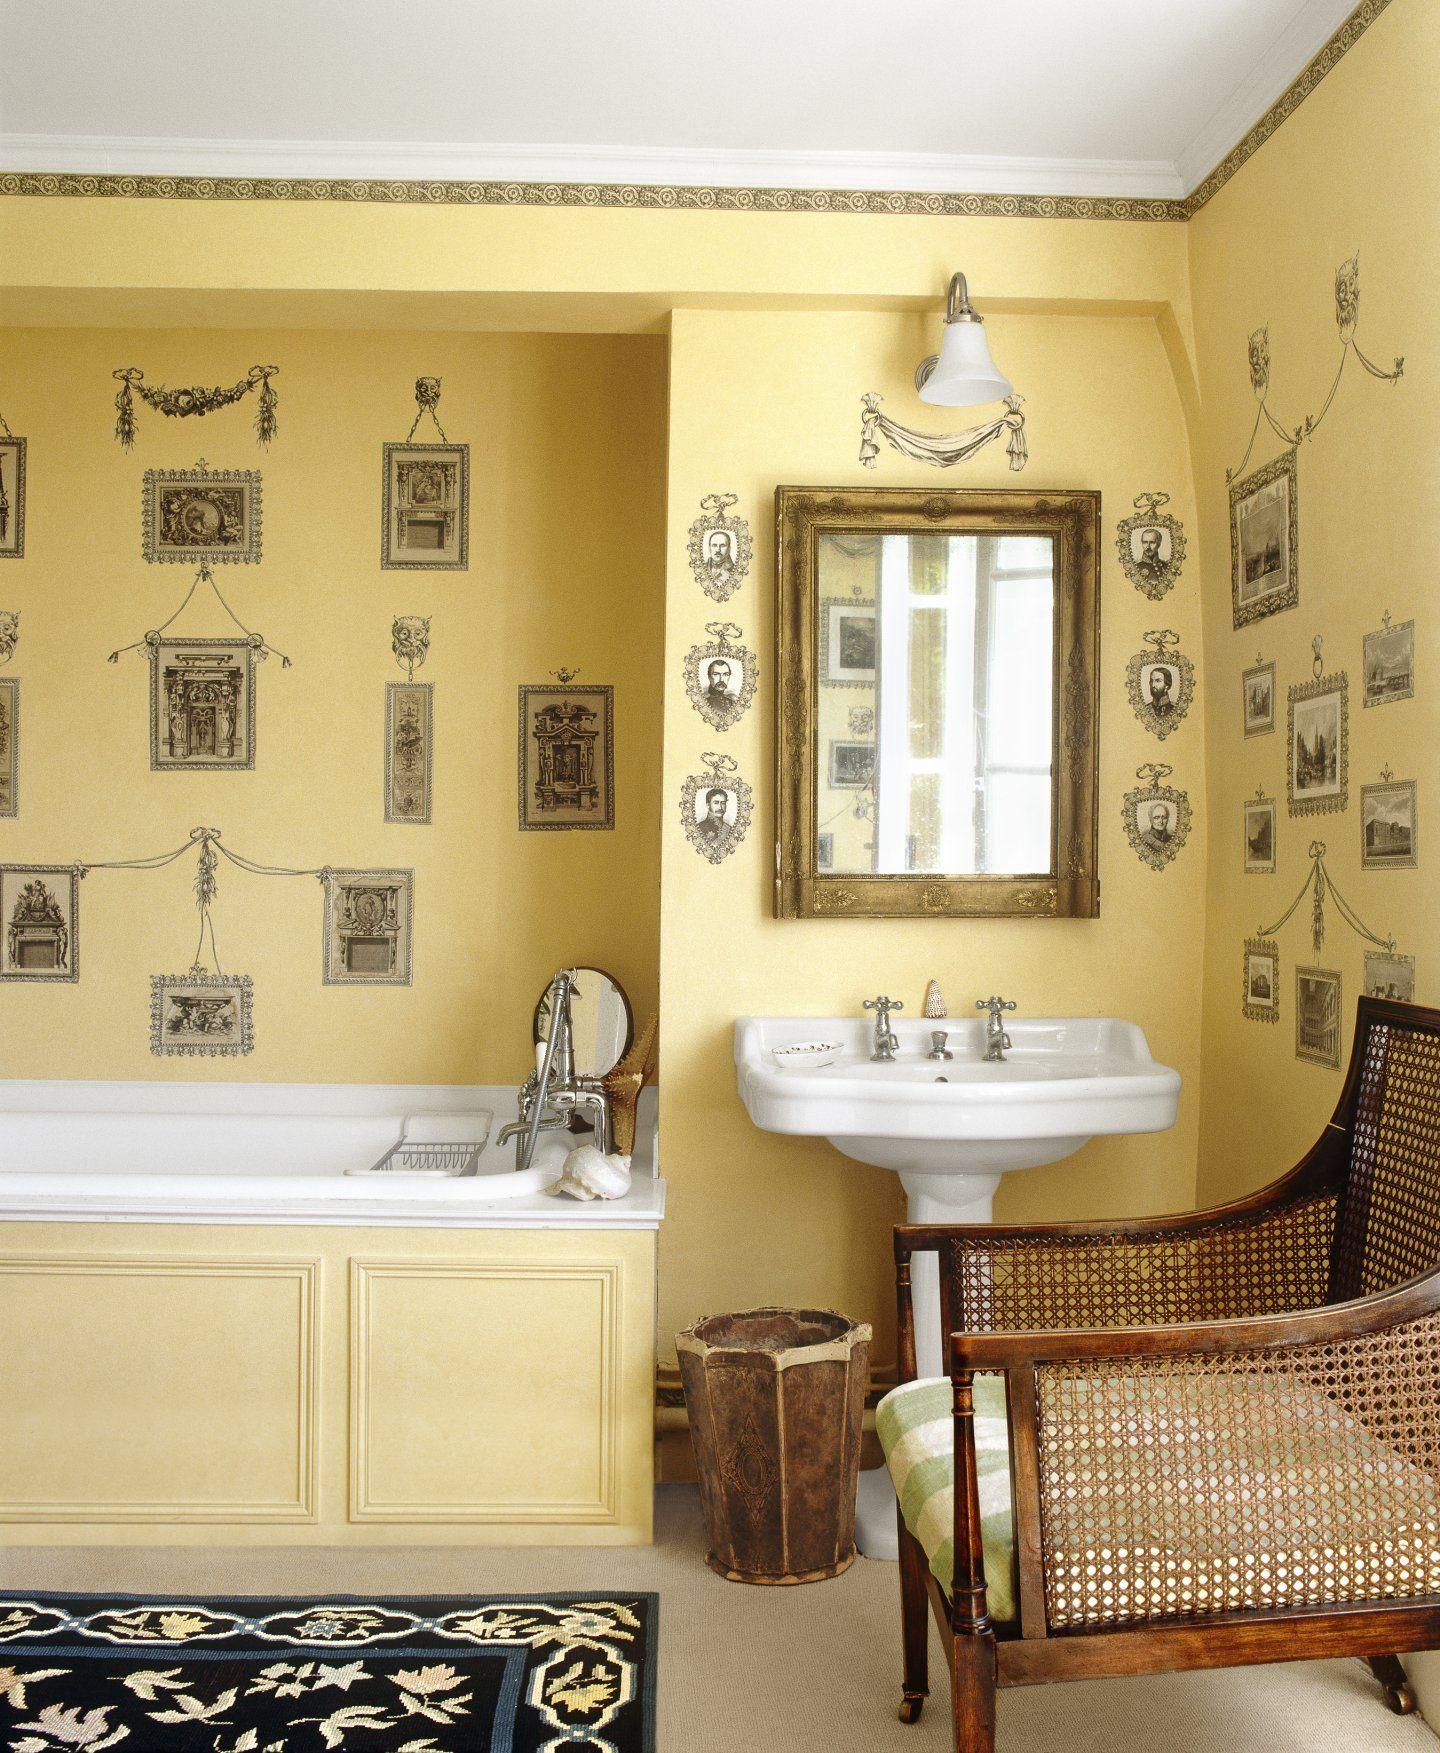 20 Budget-Friendly Bath Ideas | Wall pops, Wall sticker and Walls